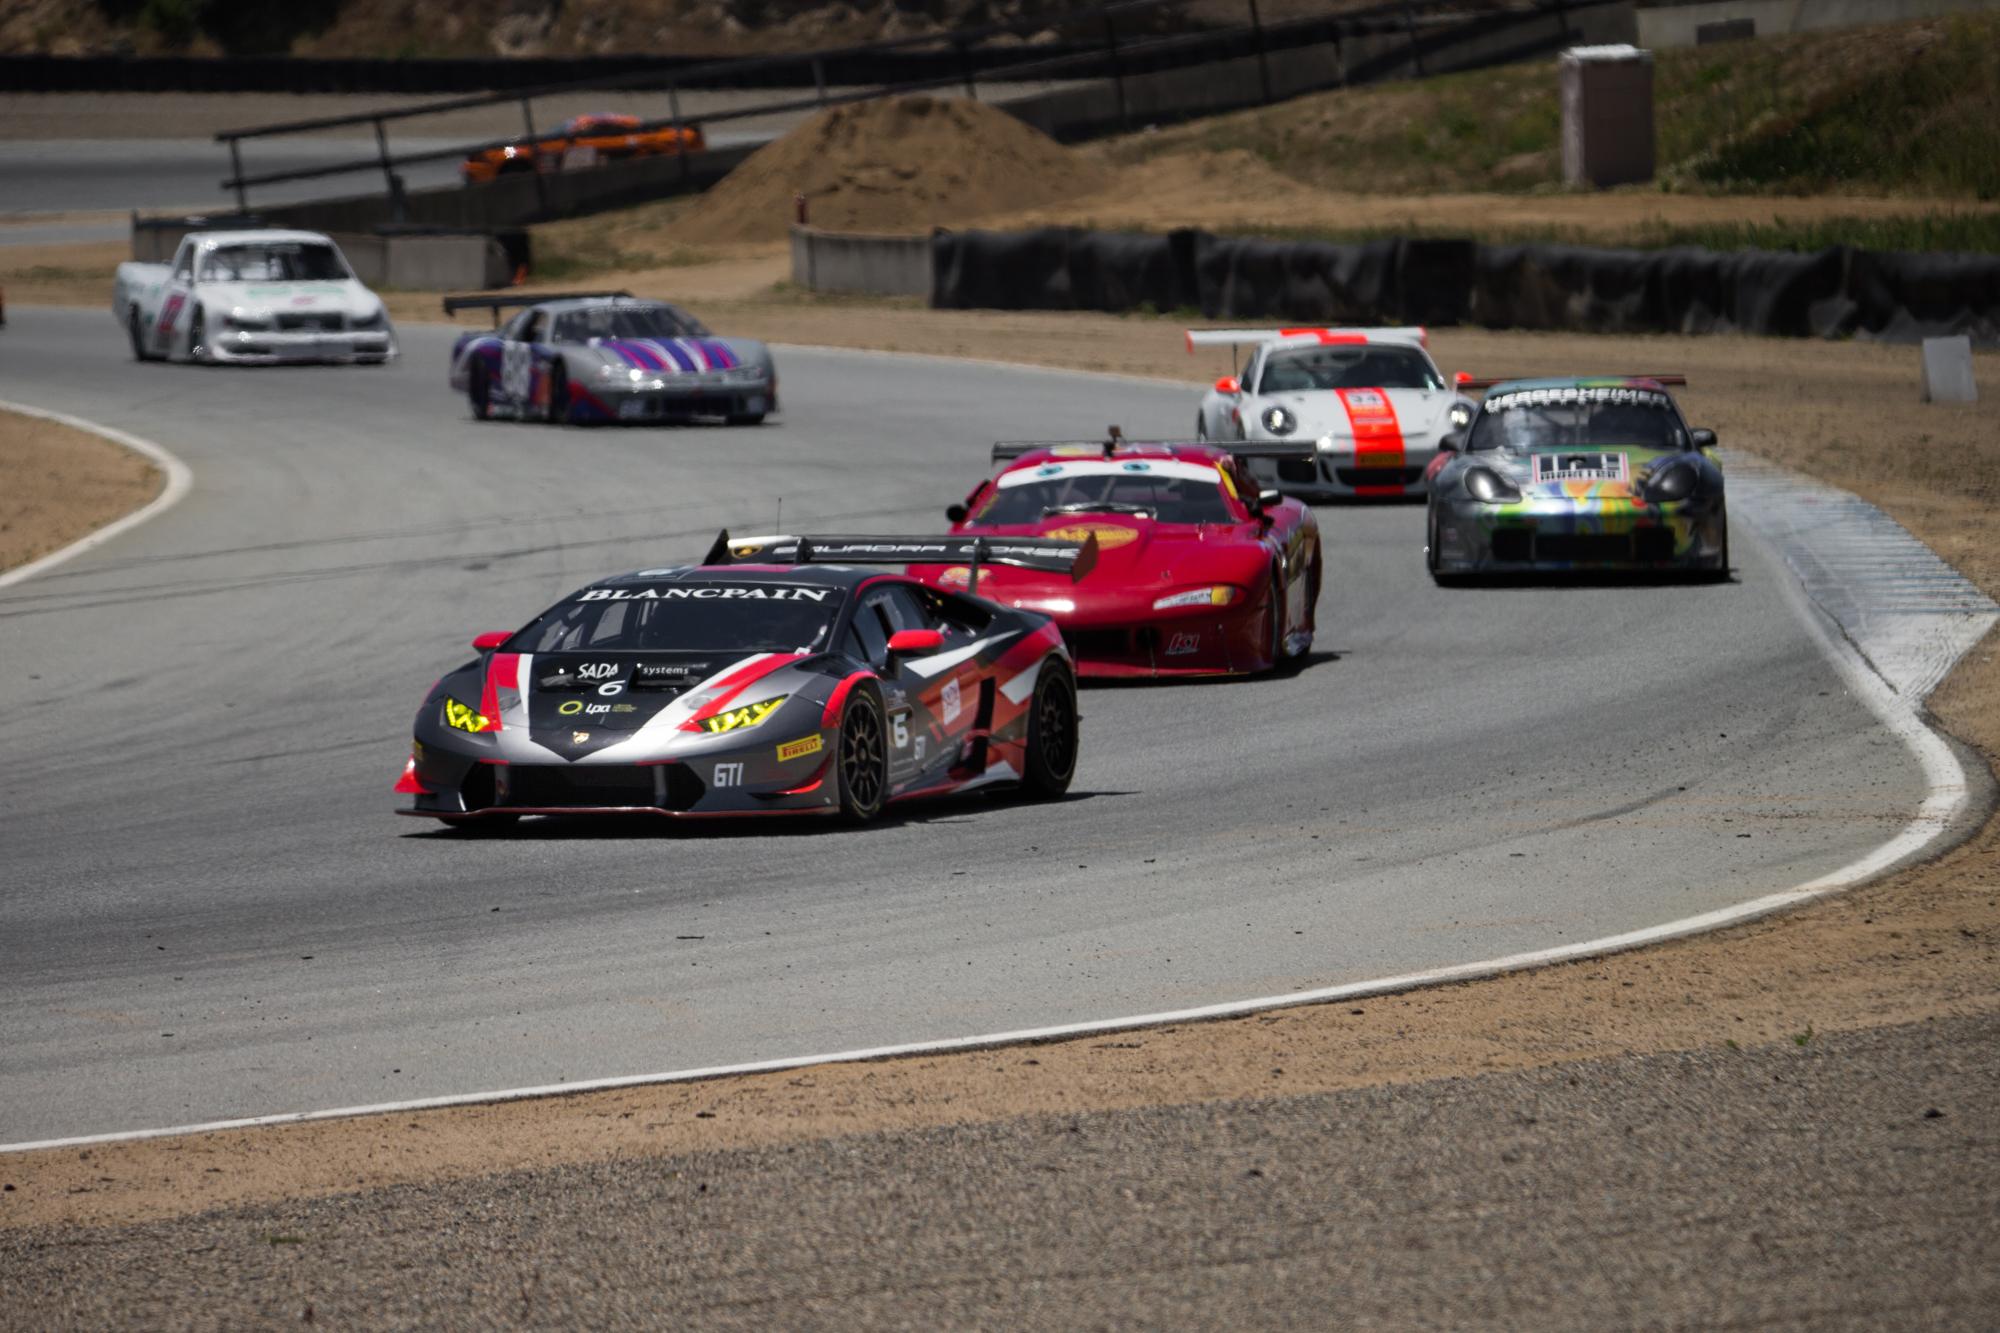 Steven-Racing-Laguna-20180603-97126.jpg